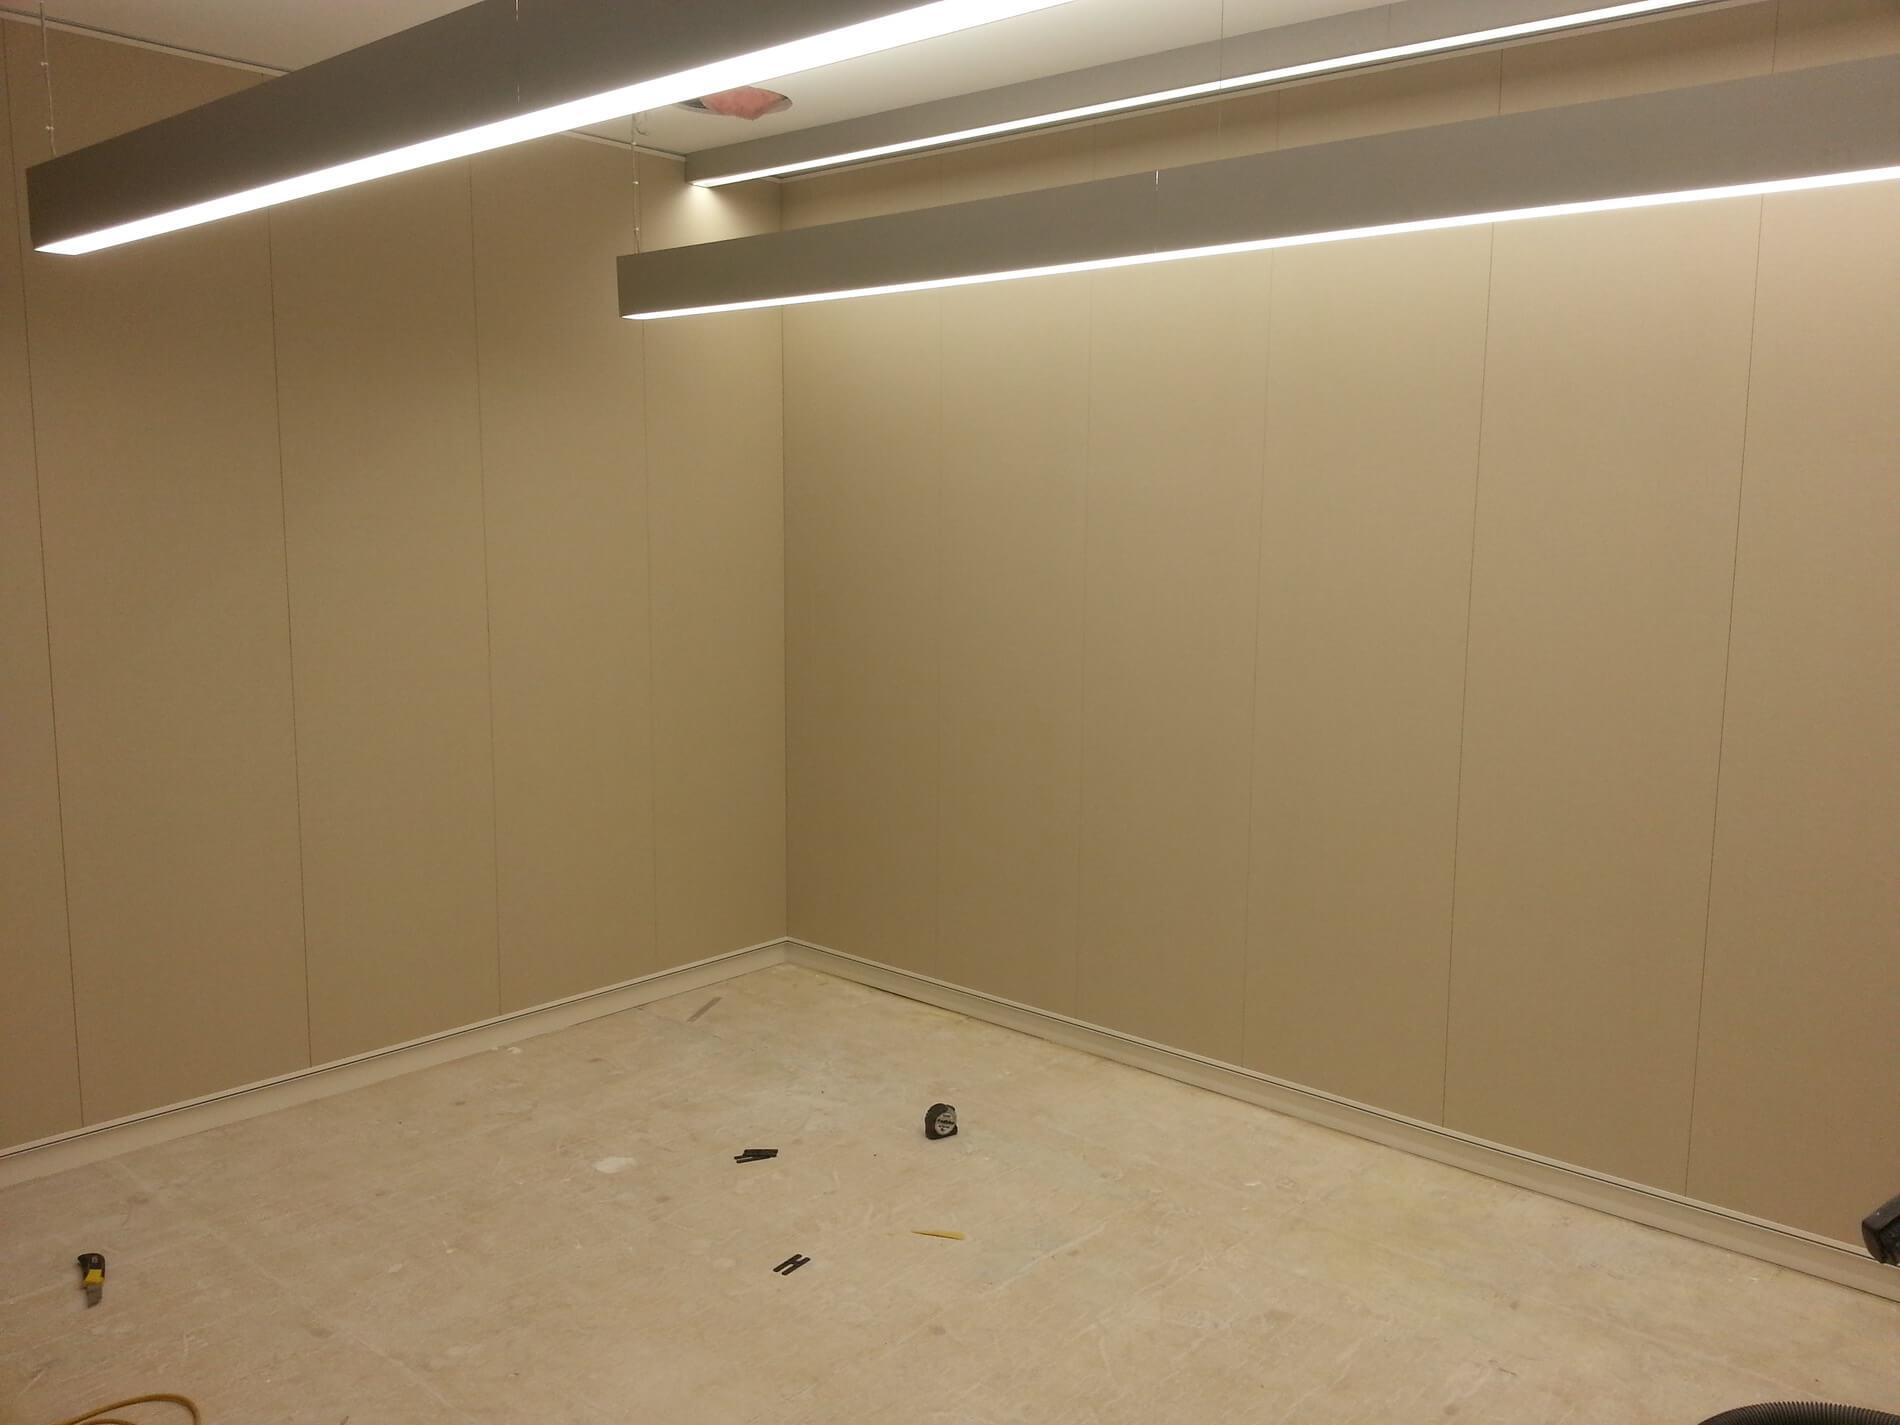 Sound Proofed Media Room